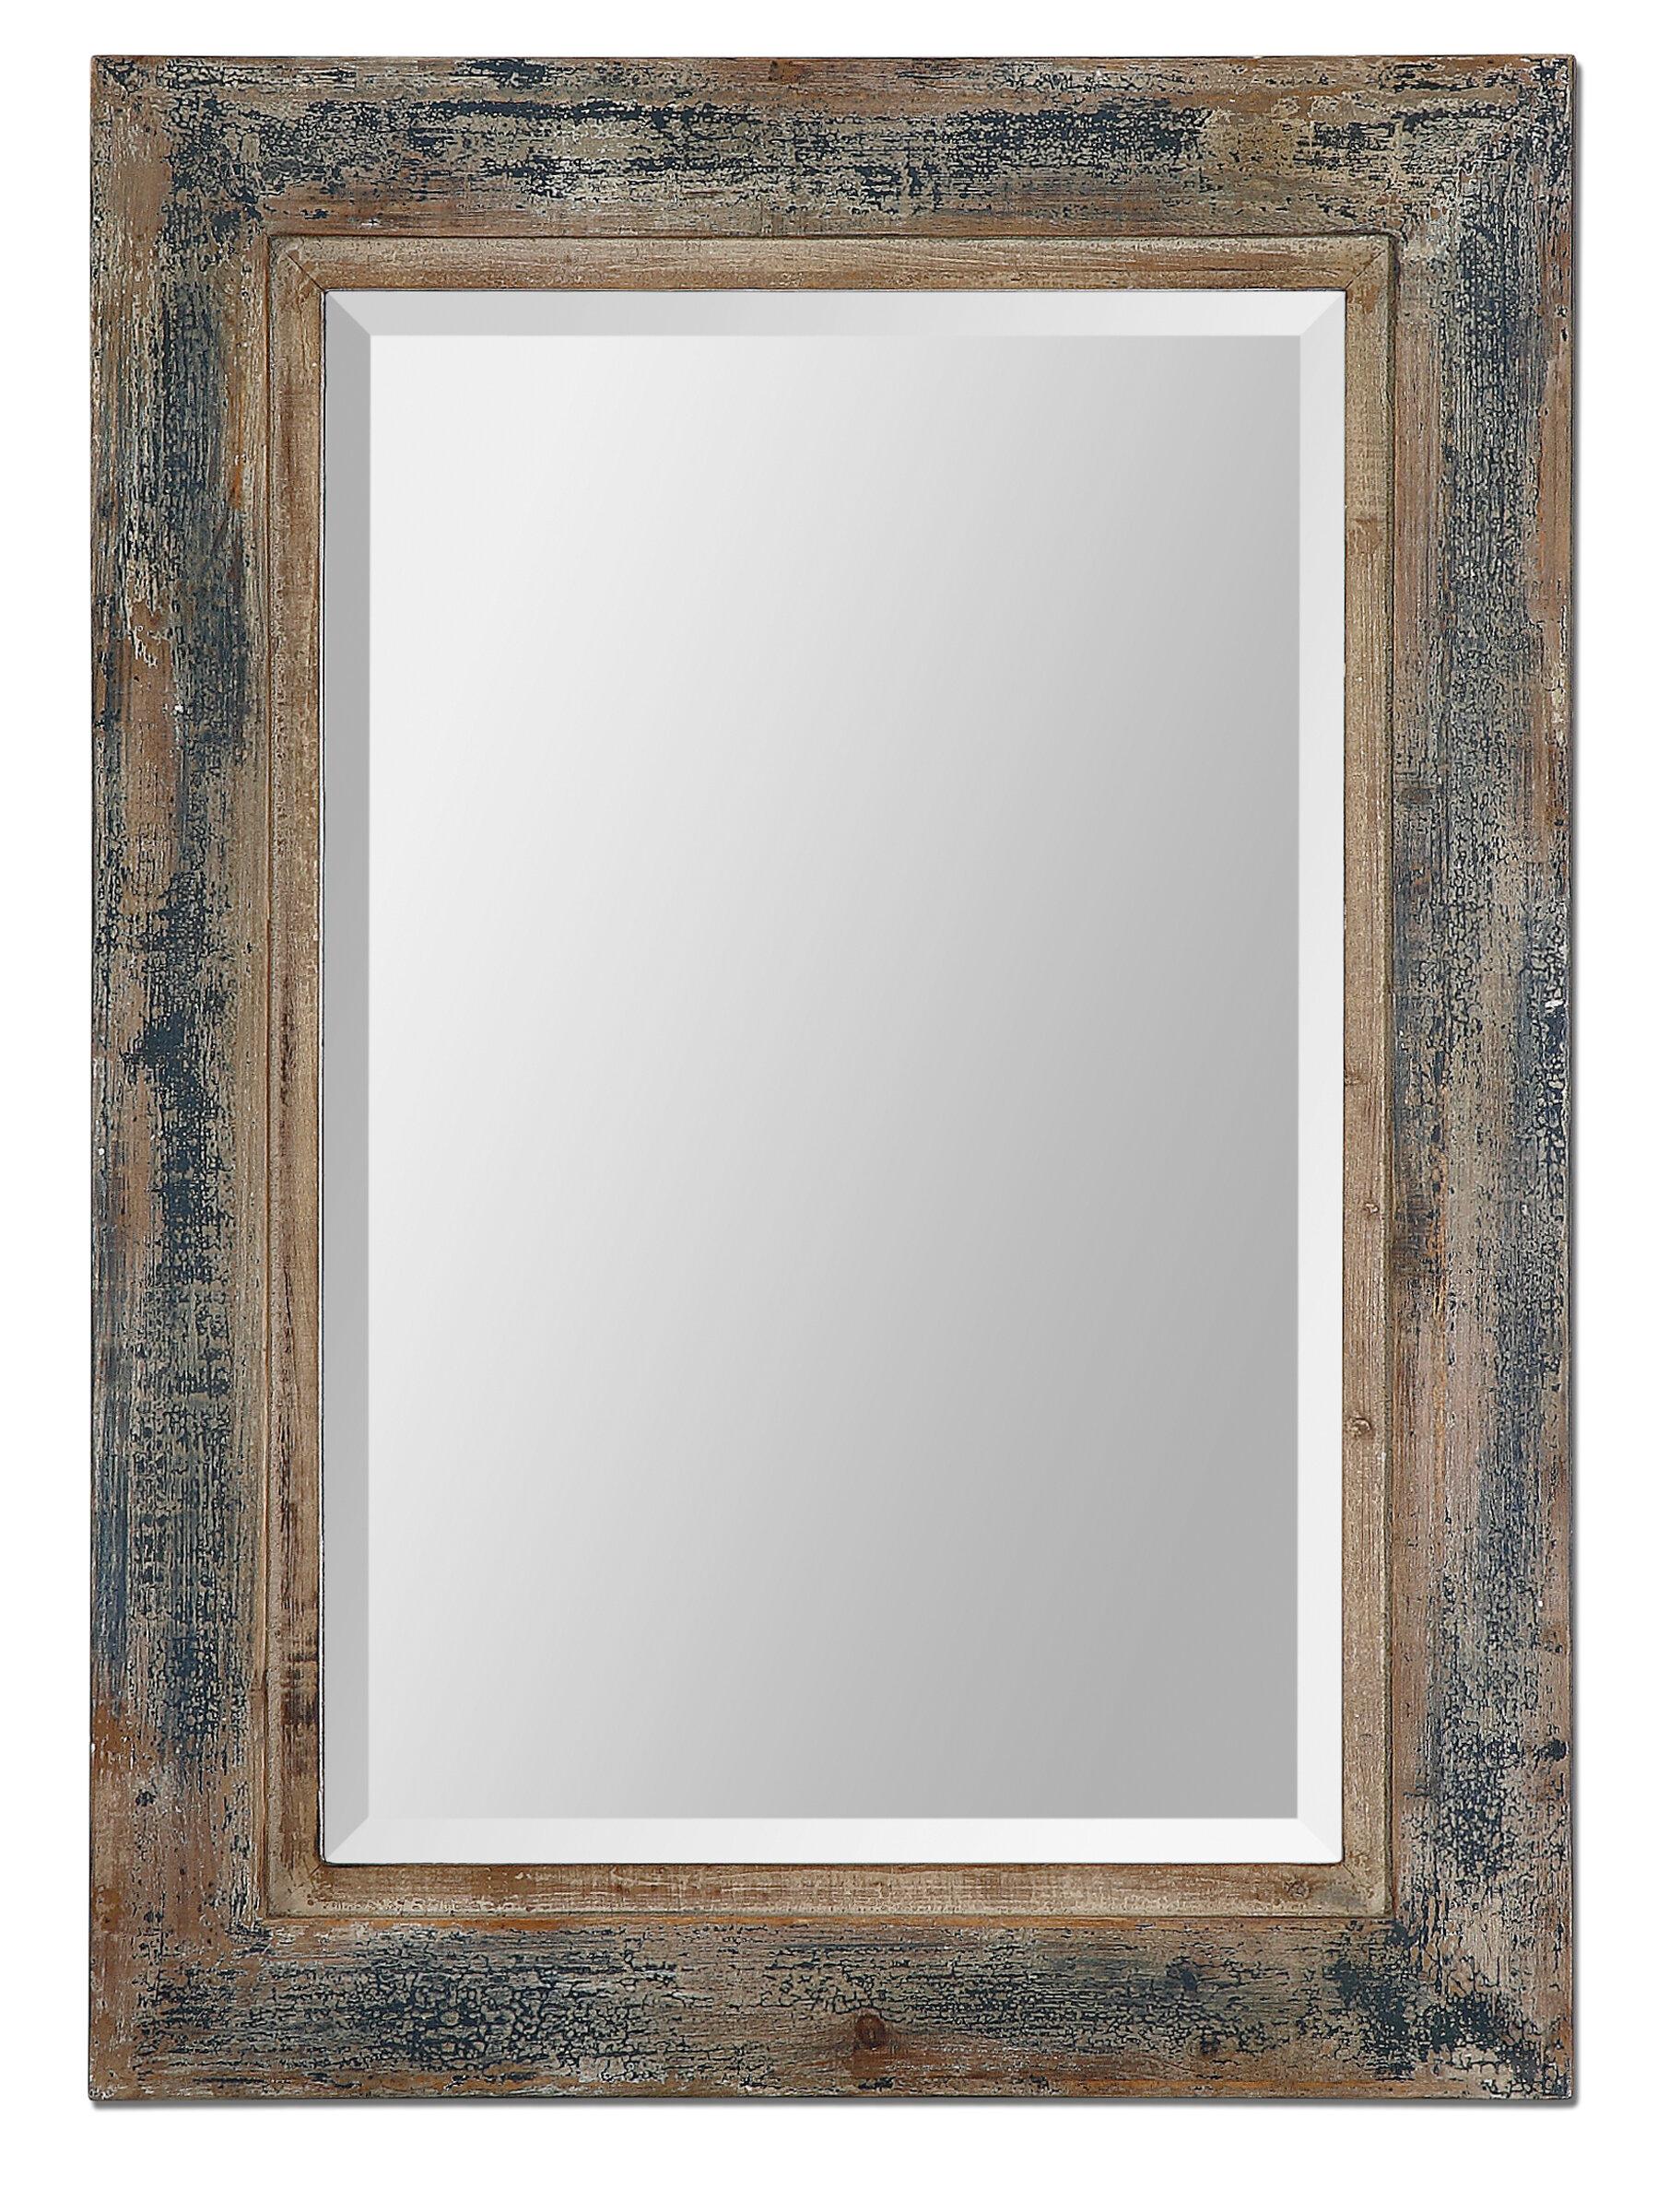 Janie rectangular wall mirror reviews allmodern